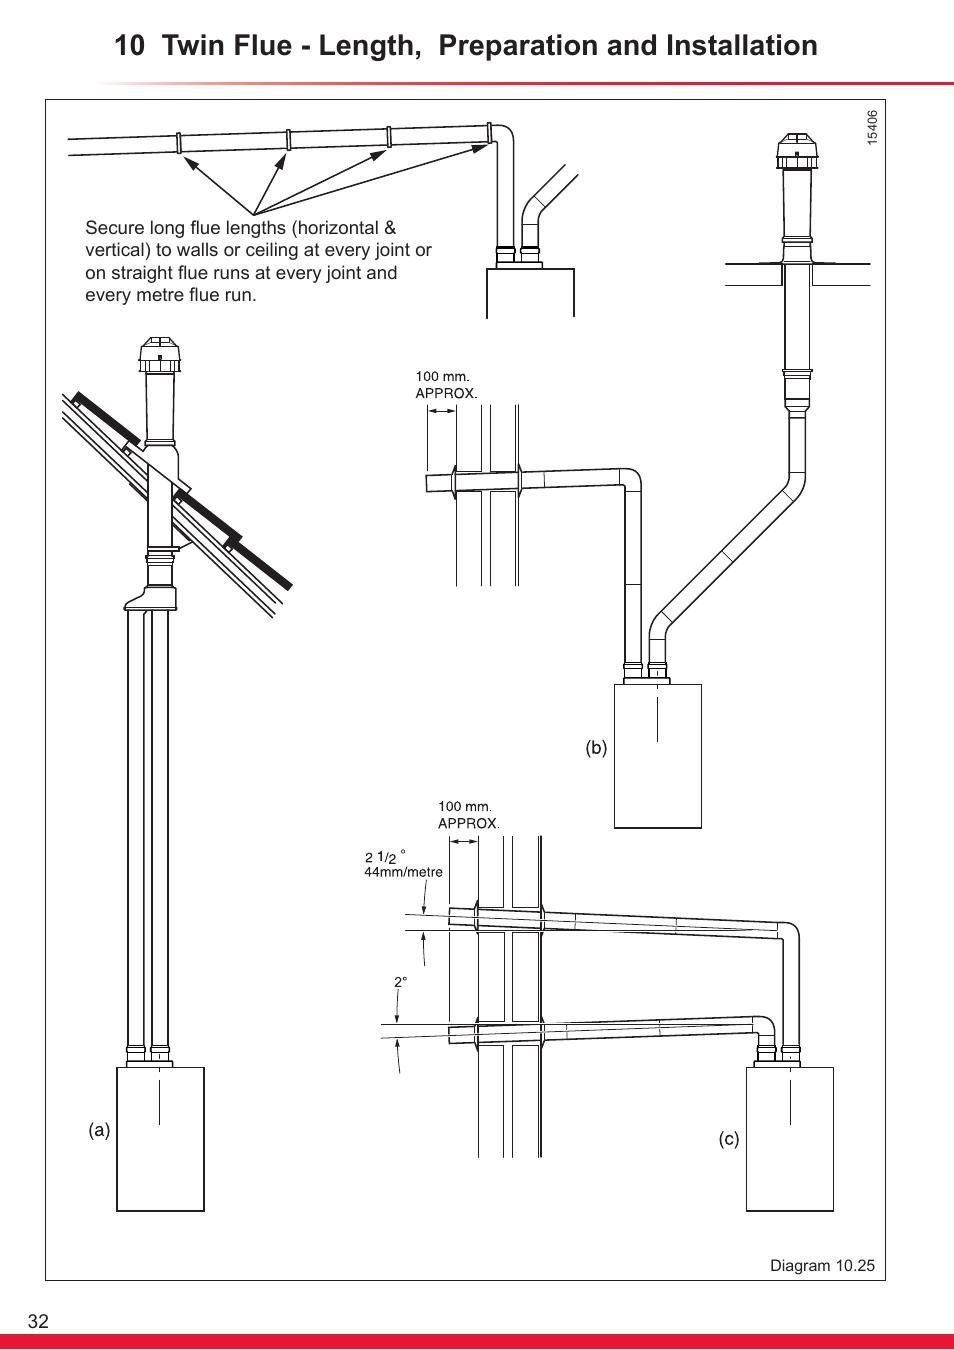 Luxury Glow Worm 38cxi Ensign - Electrical Diagram Ideas - piotomar.info